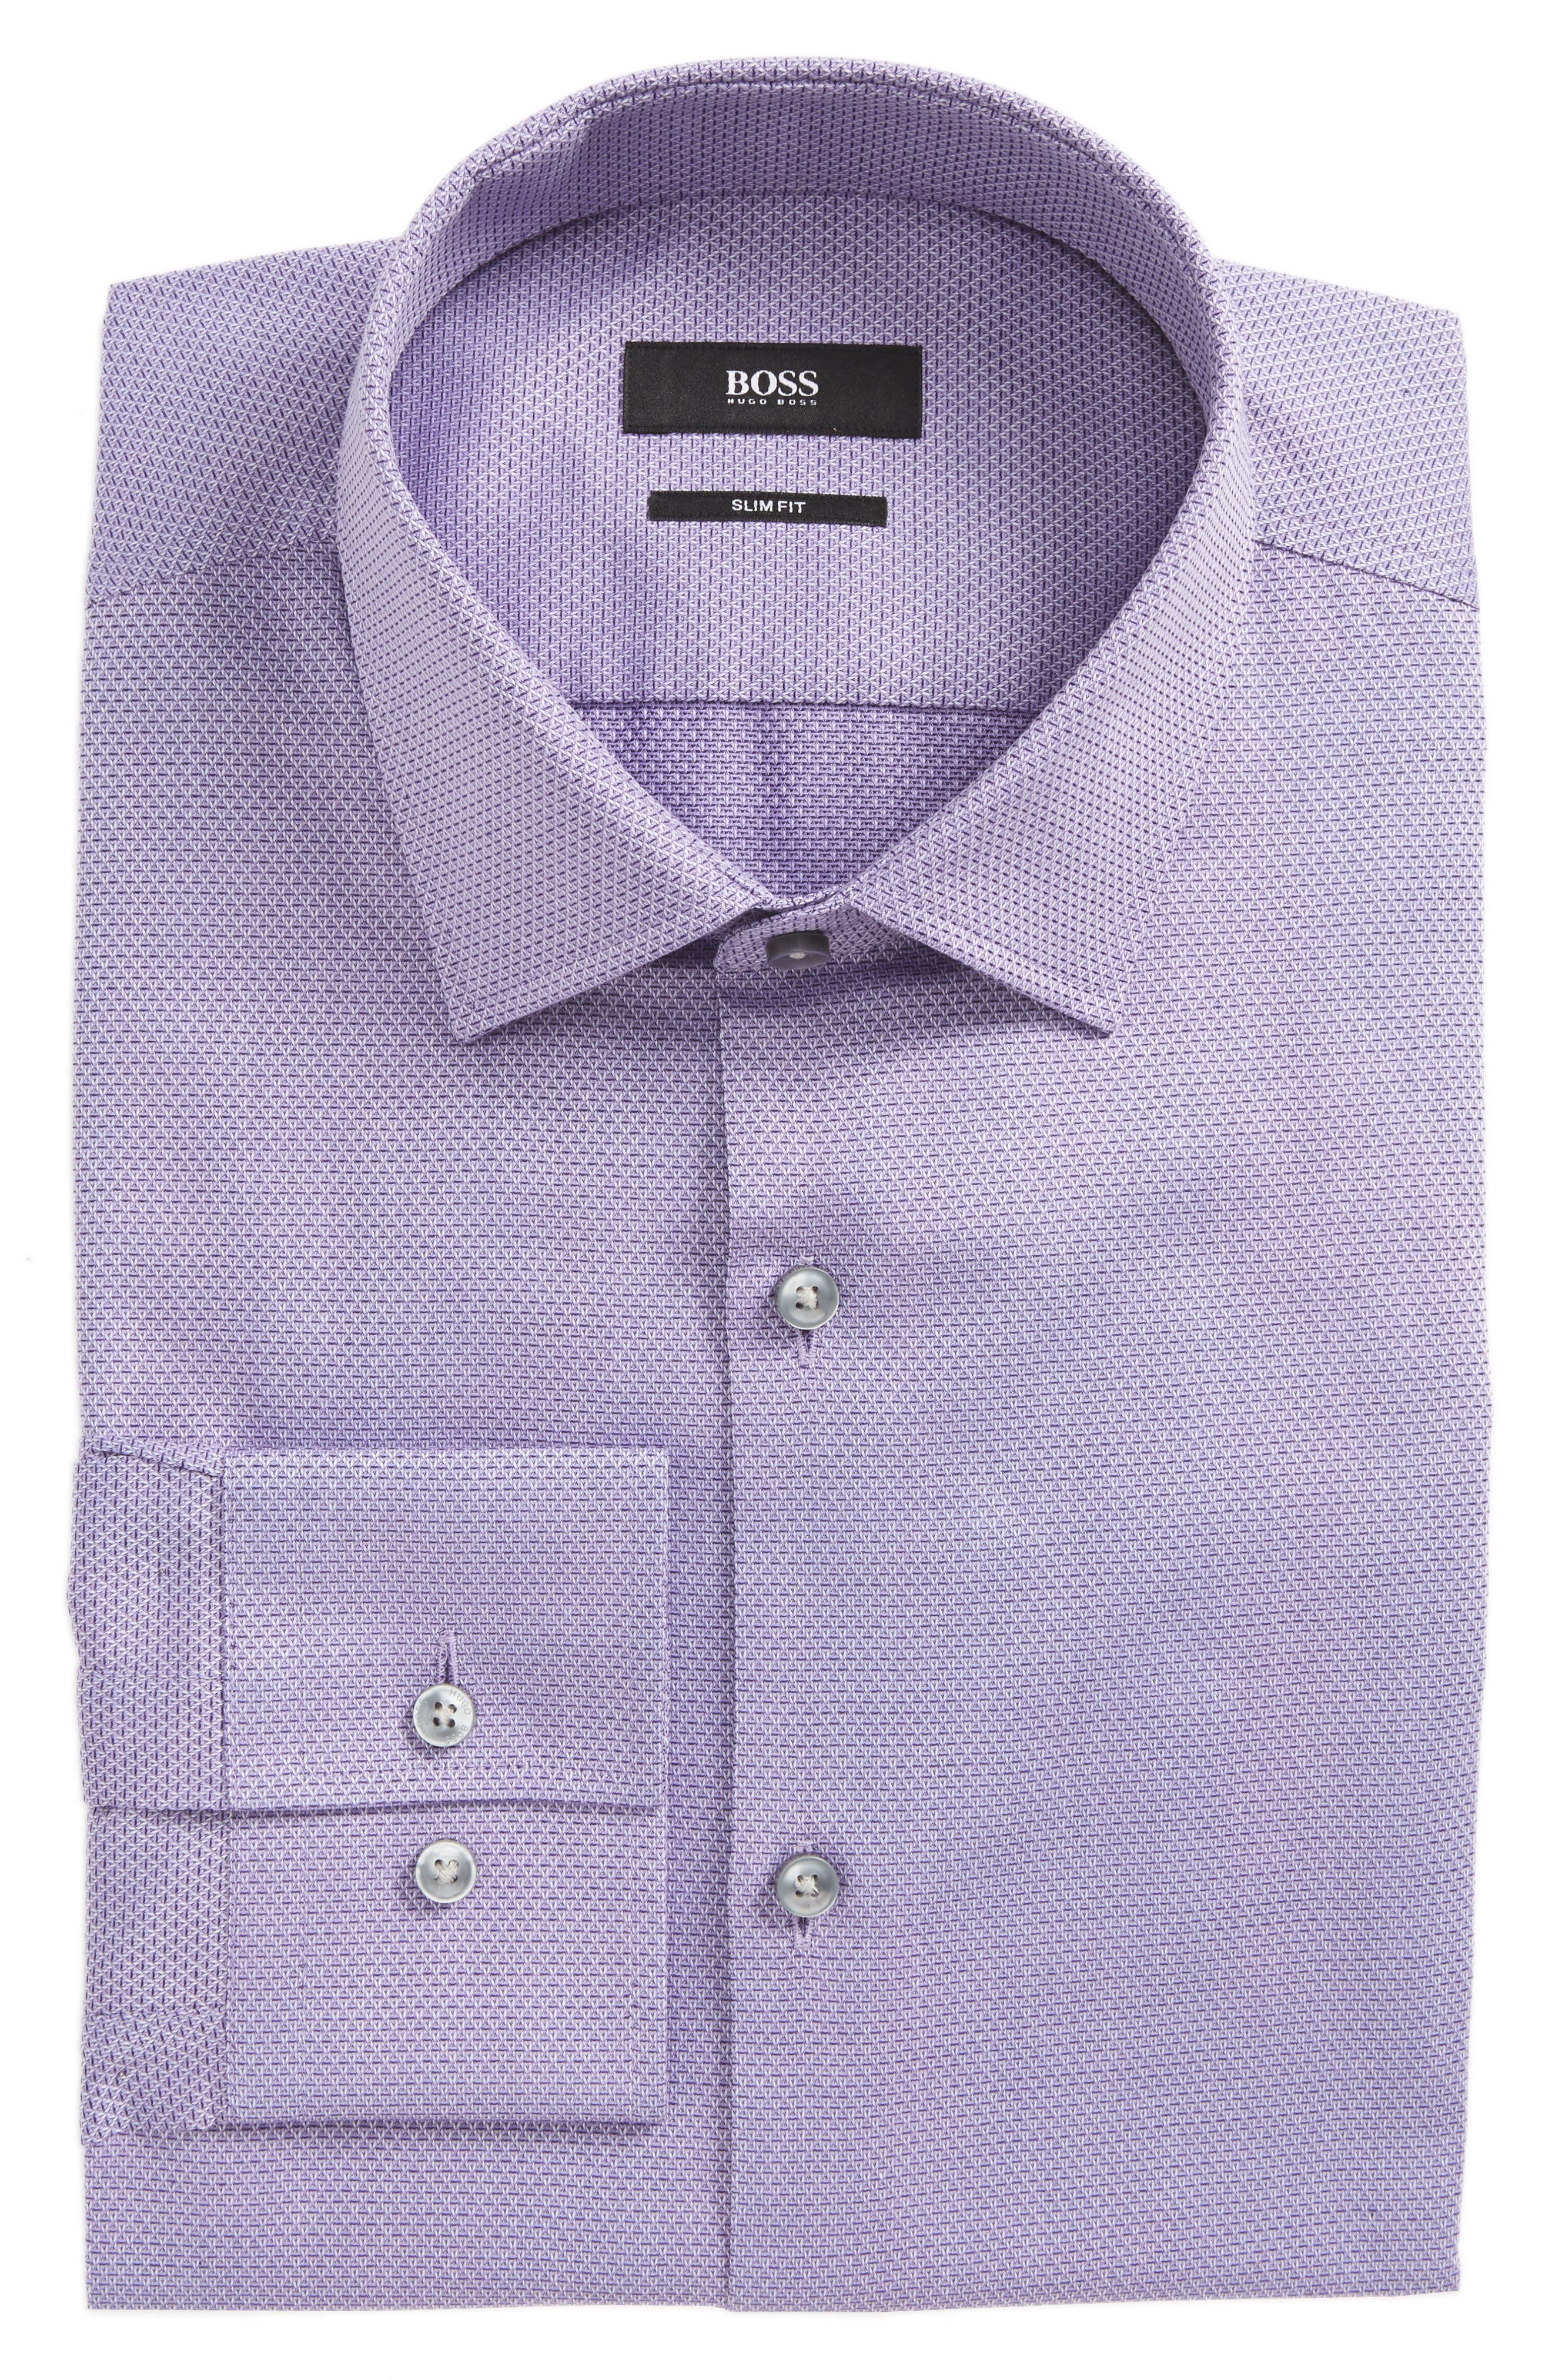 Jenno Slim Fit Textured Dress Shirt,                         Main,                         color, Medium Purple